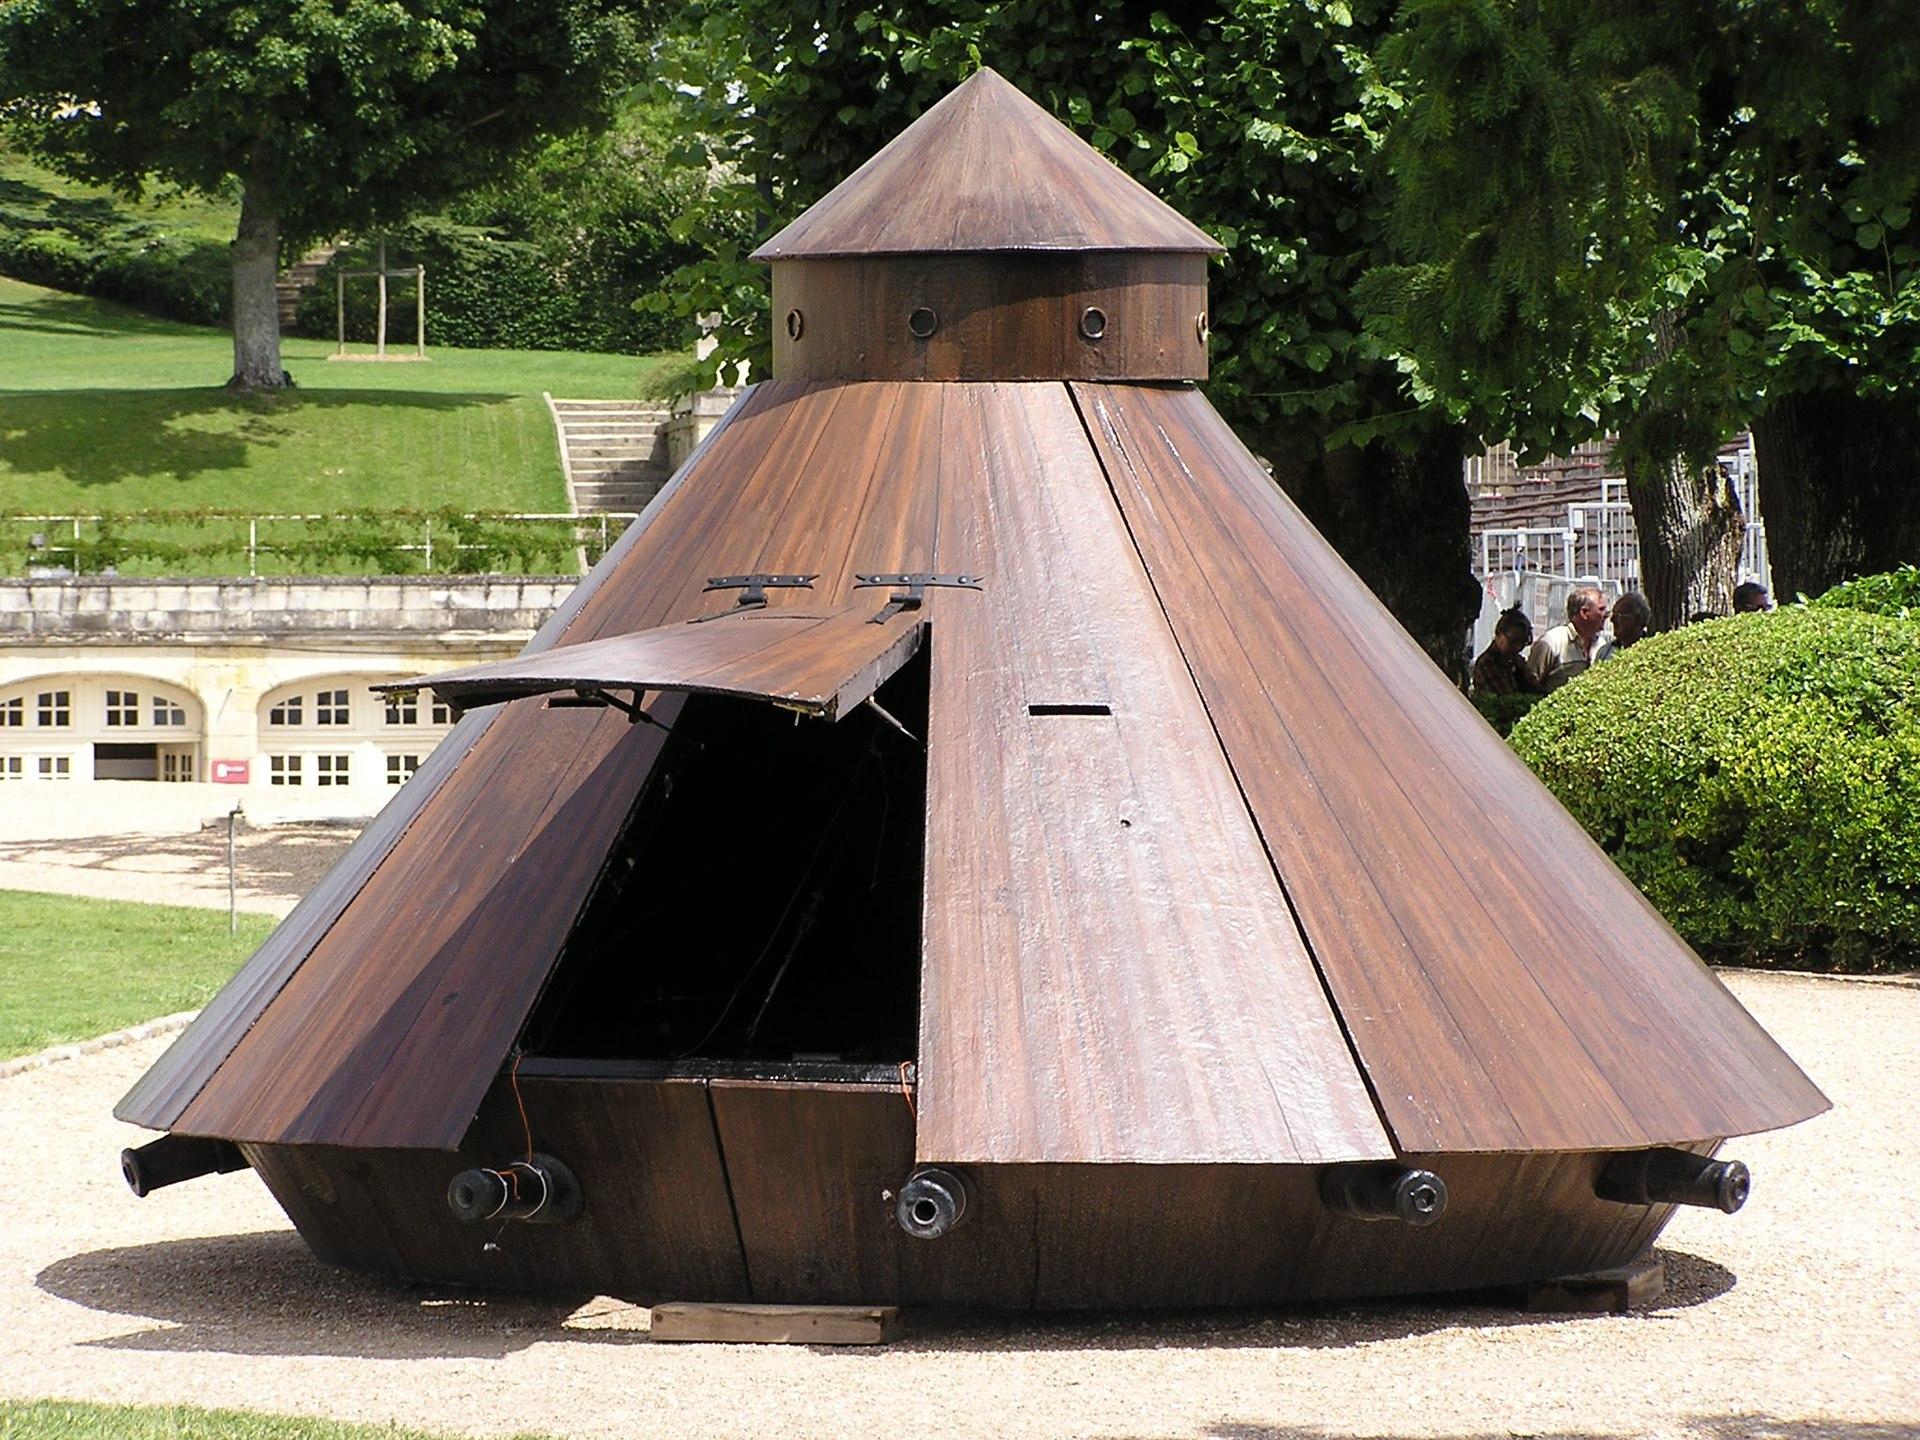 Histoire du char de combat wikip dia for Histoire des jardins wikipedia